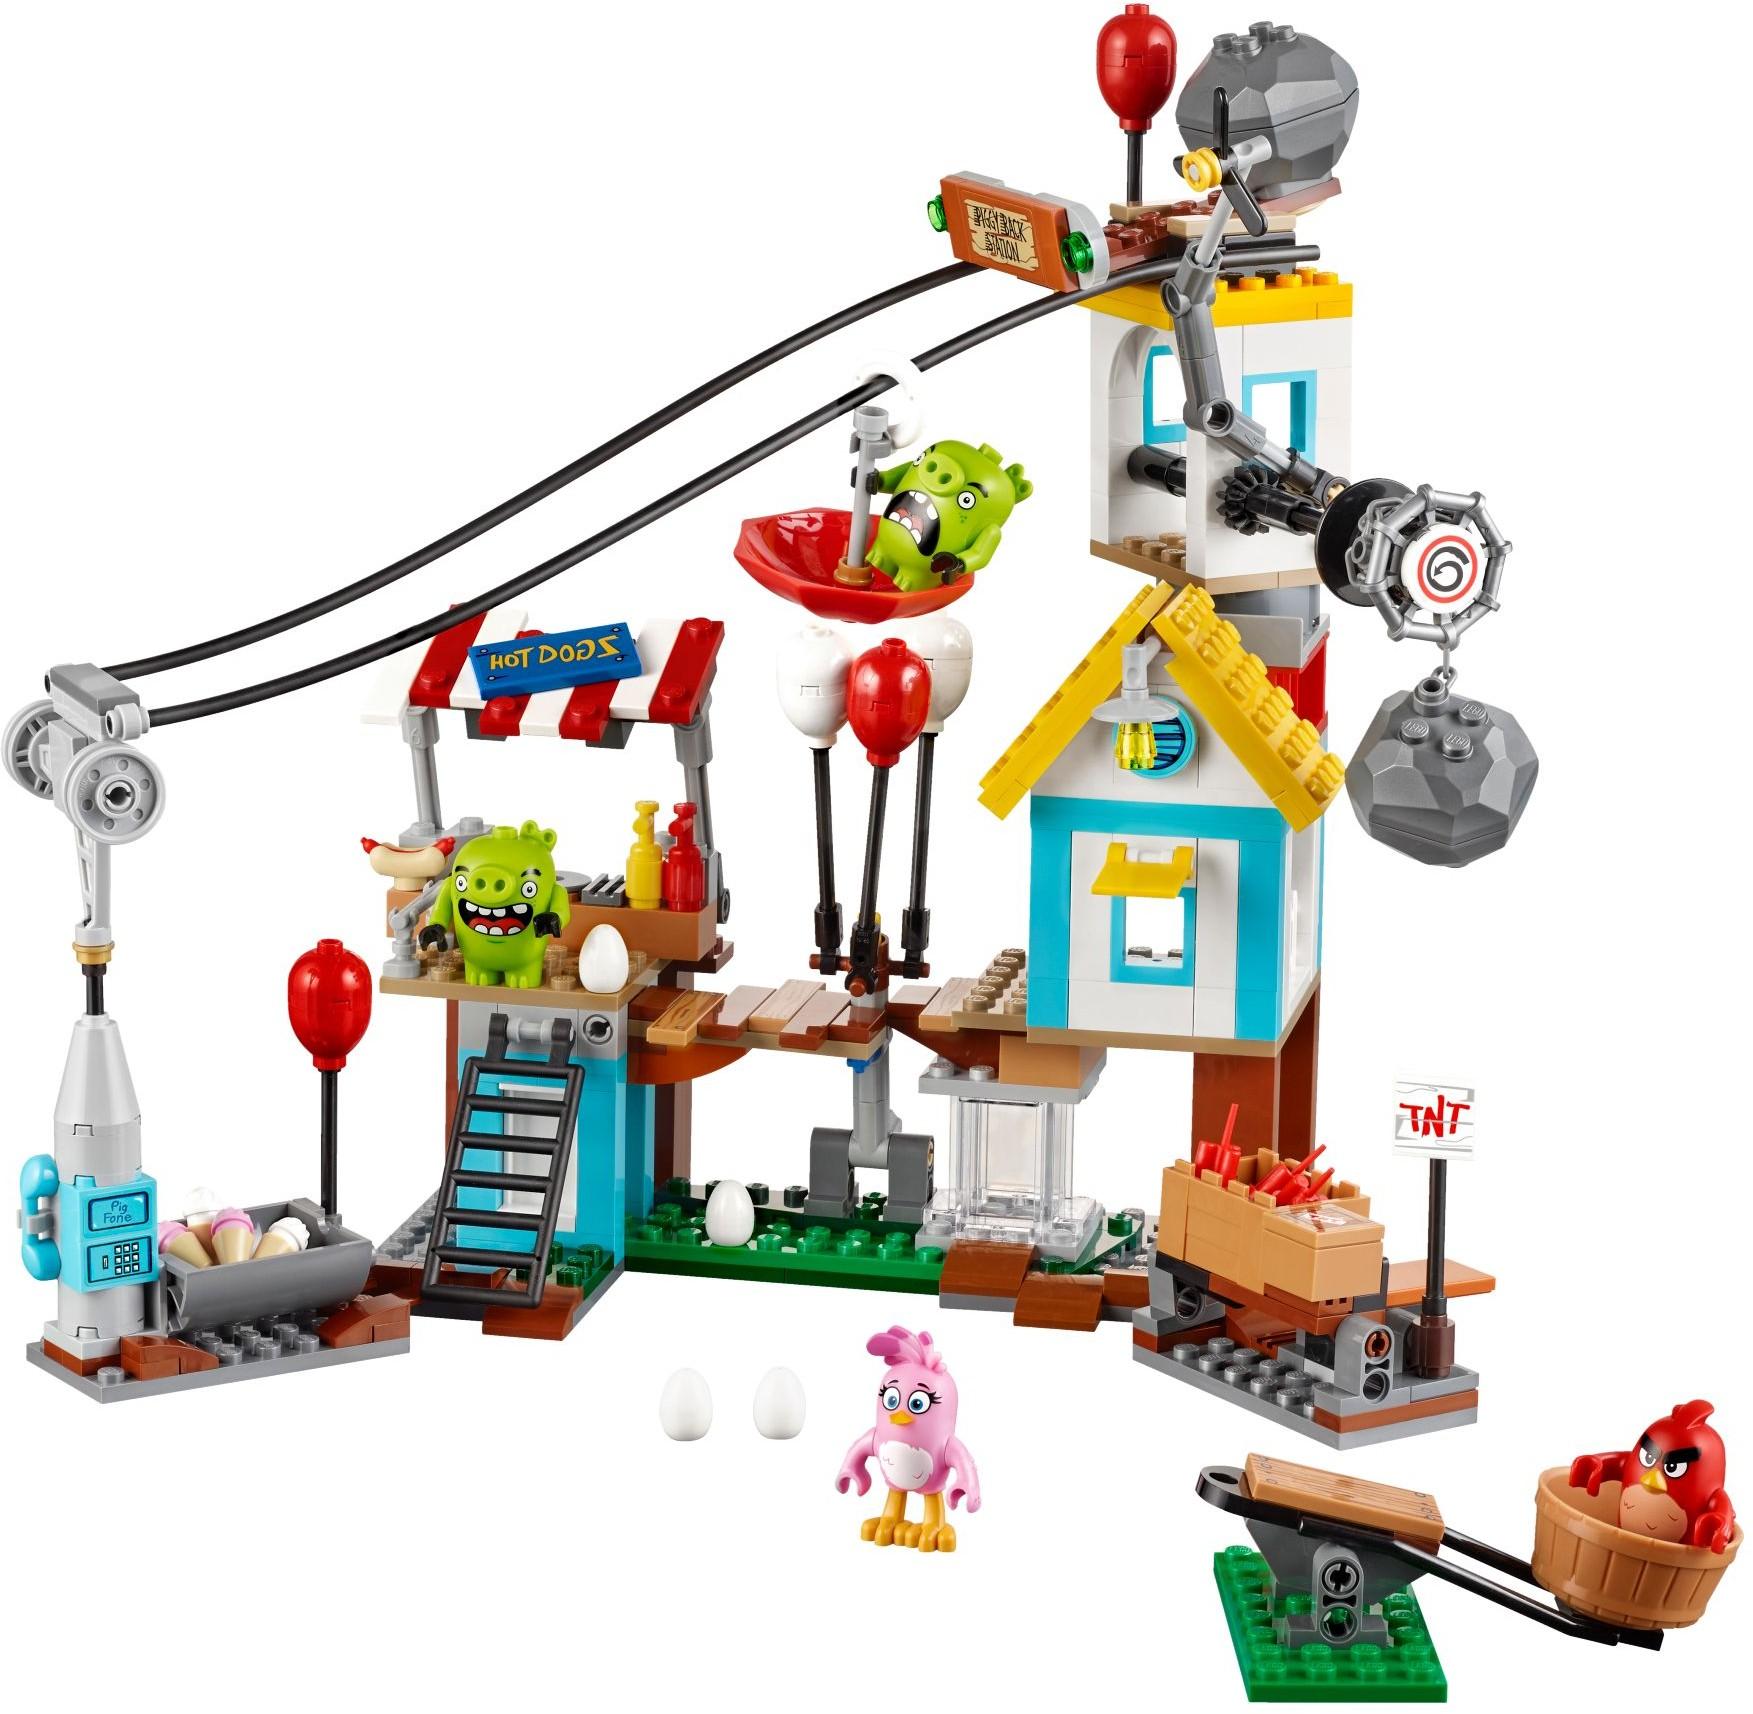 The Angry Birds Movie Brickset Lego Set Guide And Database